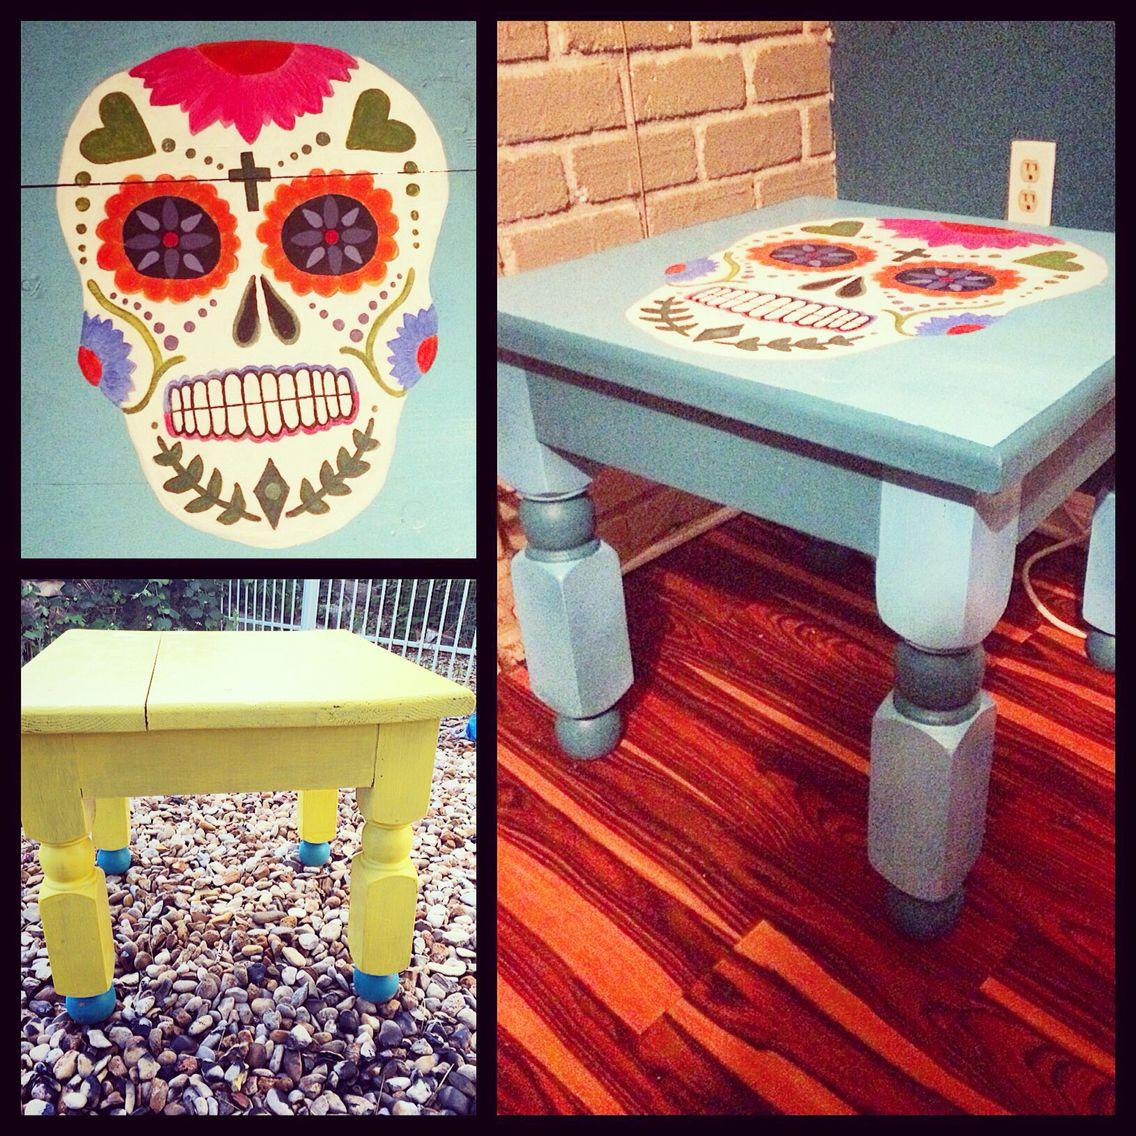 Day Of The Dead Side Table Diy Furniture Diadelosmuertos Customfurniture